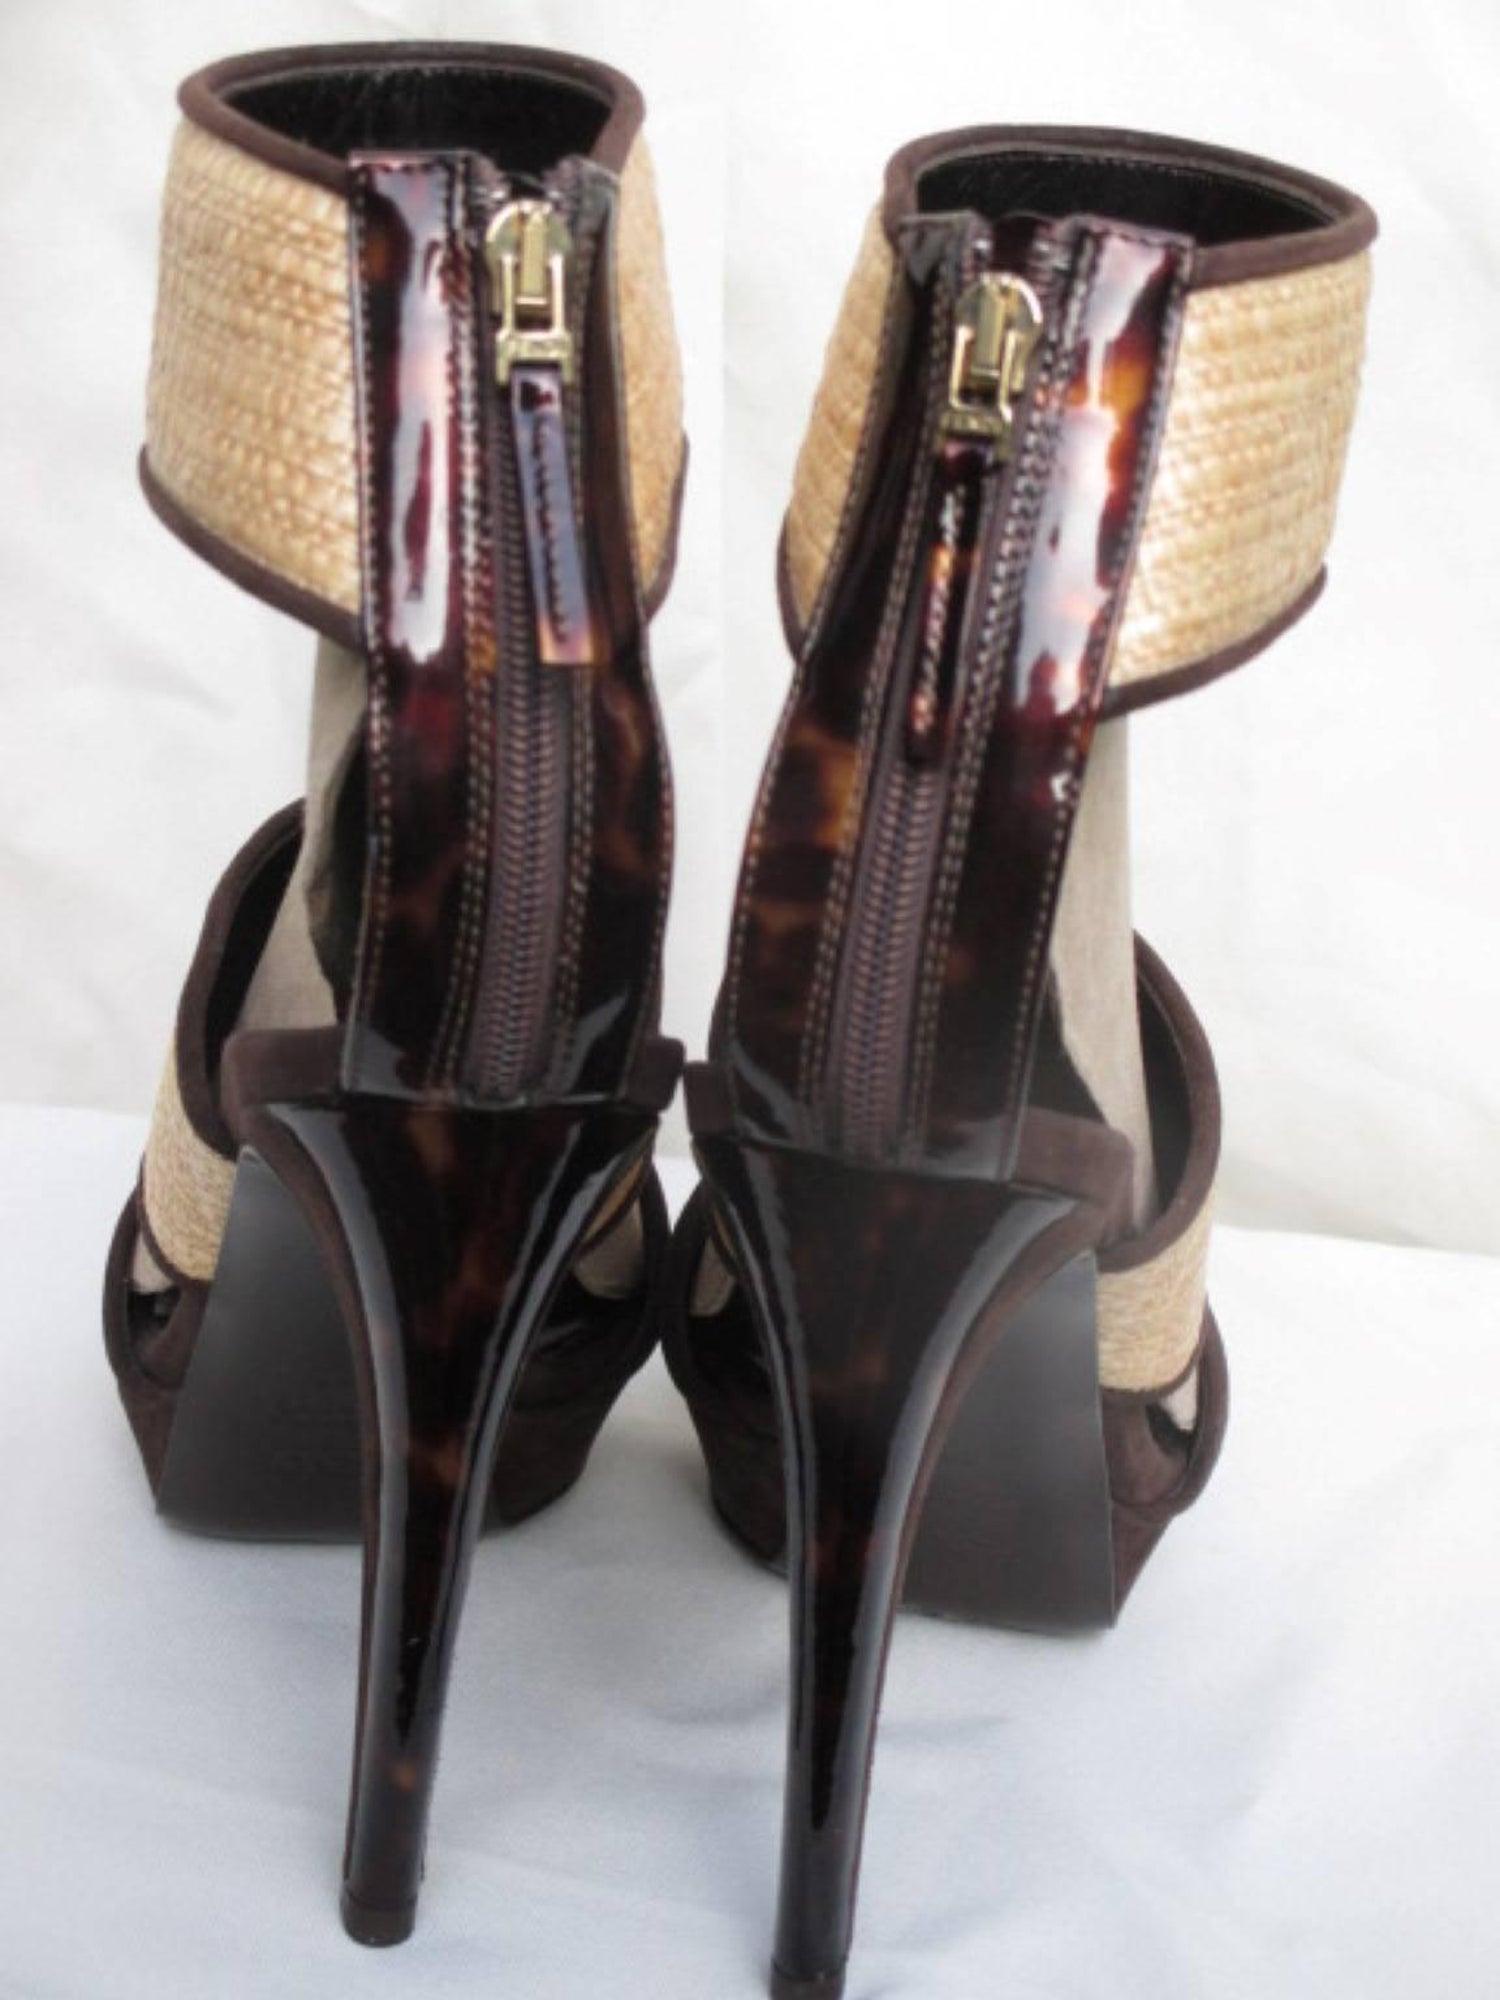 985fb560beb fendi Brown suede leather and wicker high heels